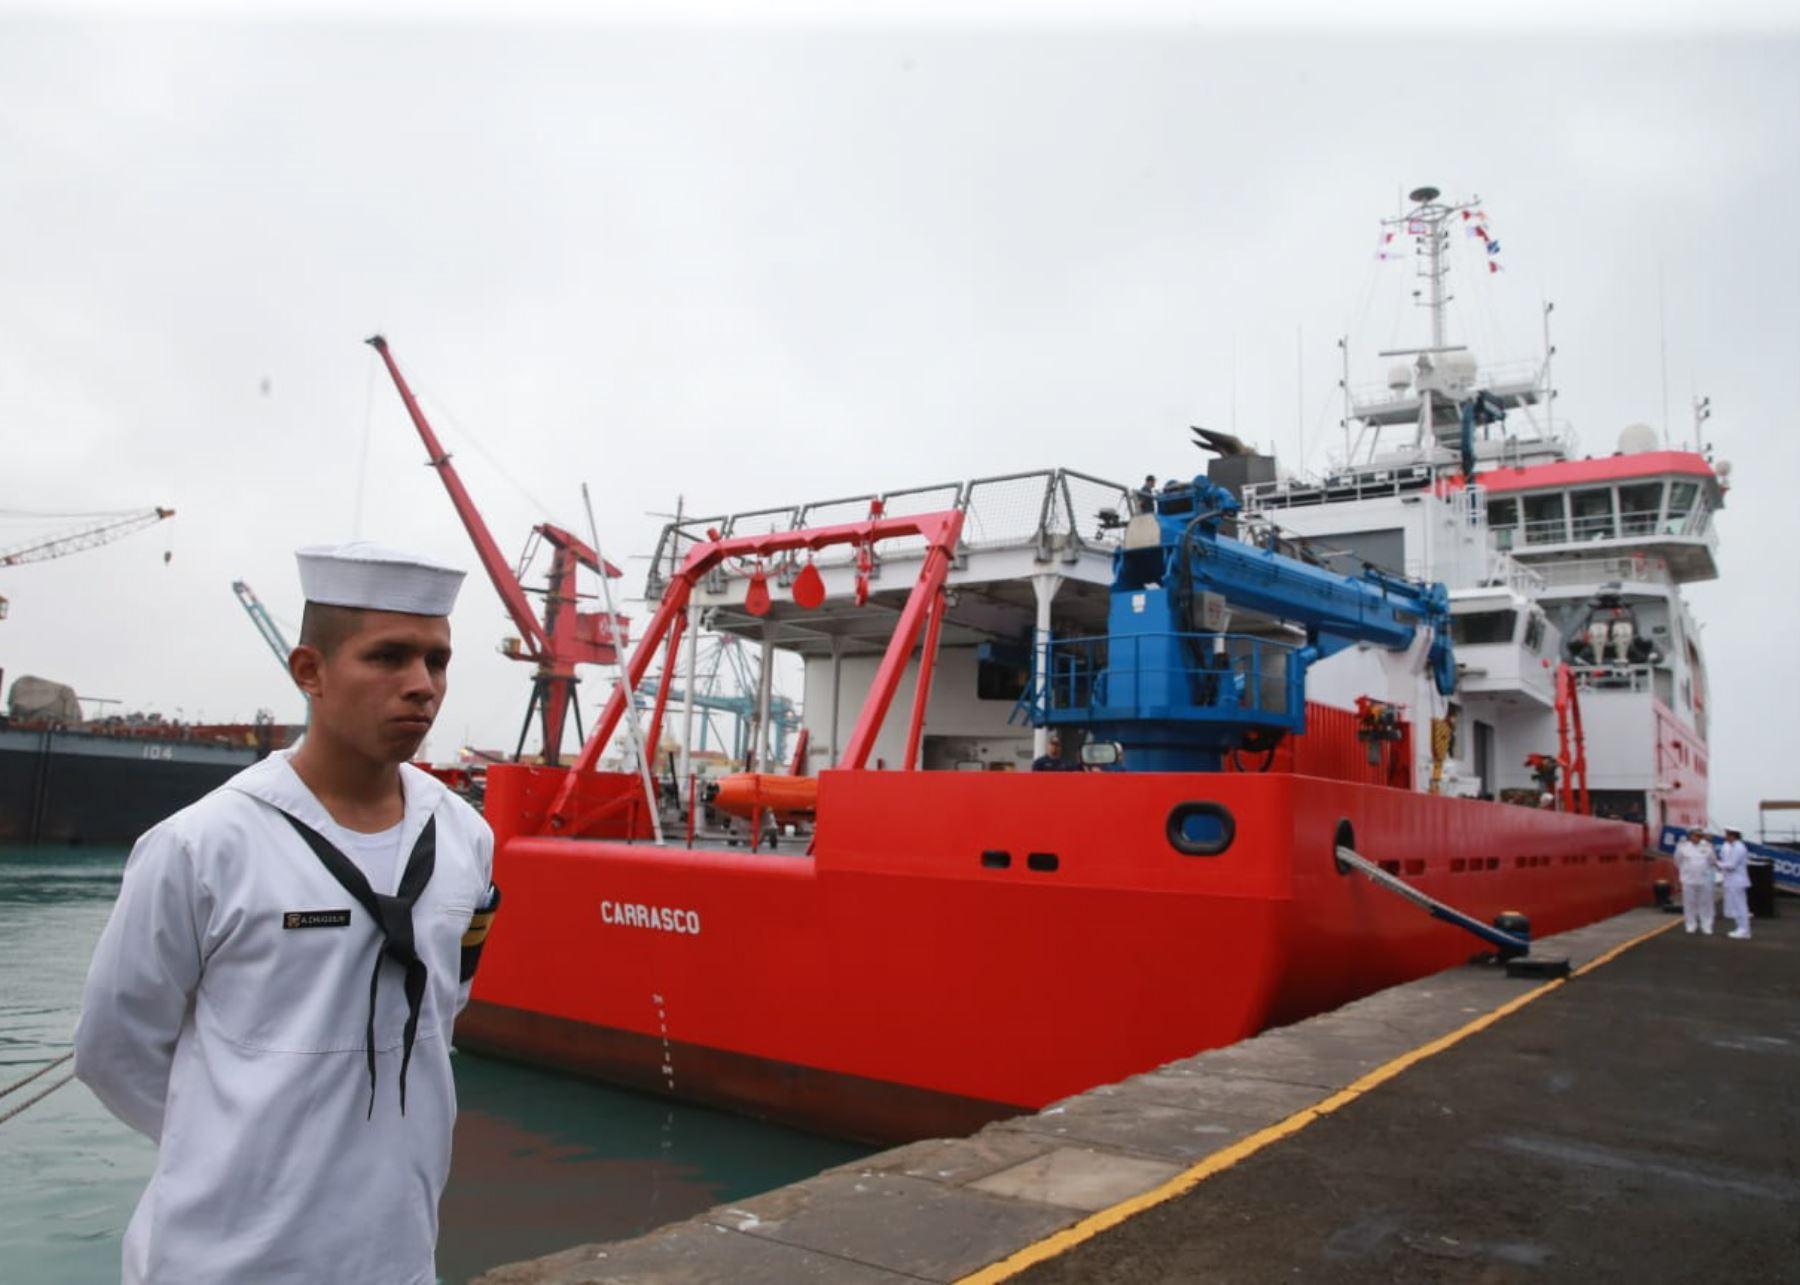 BAP Carrasco zarpó rumbo a la Antártida.